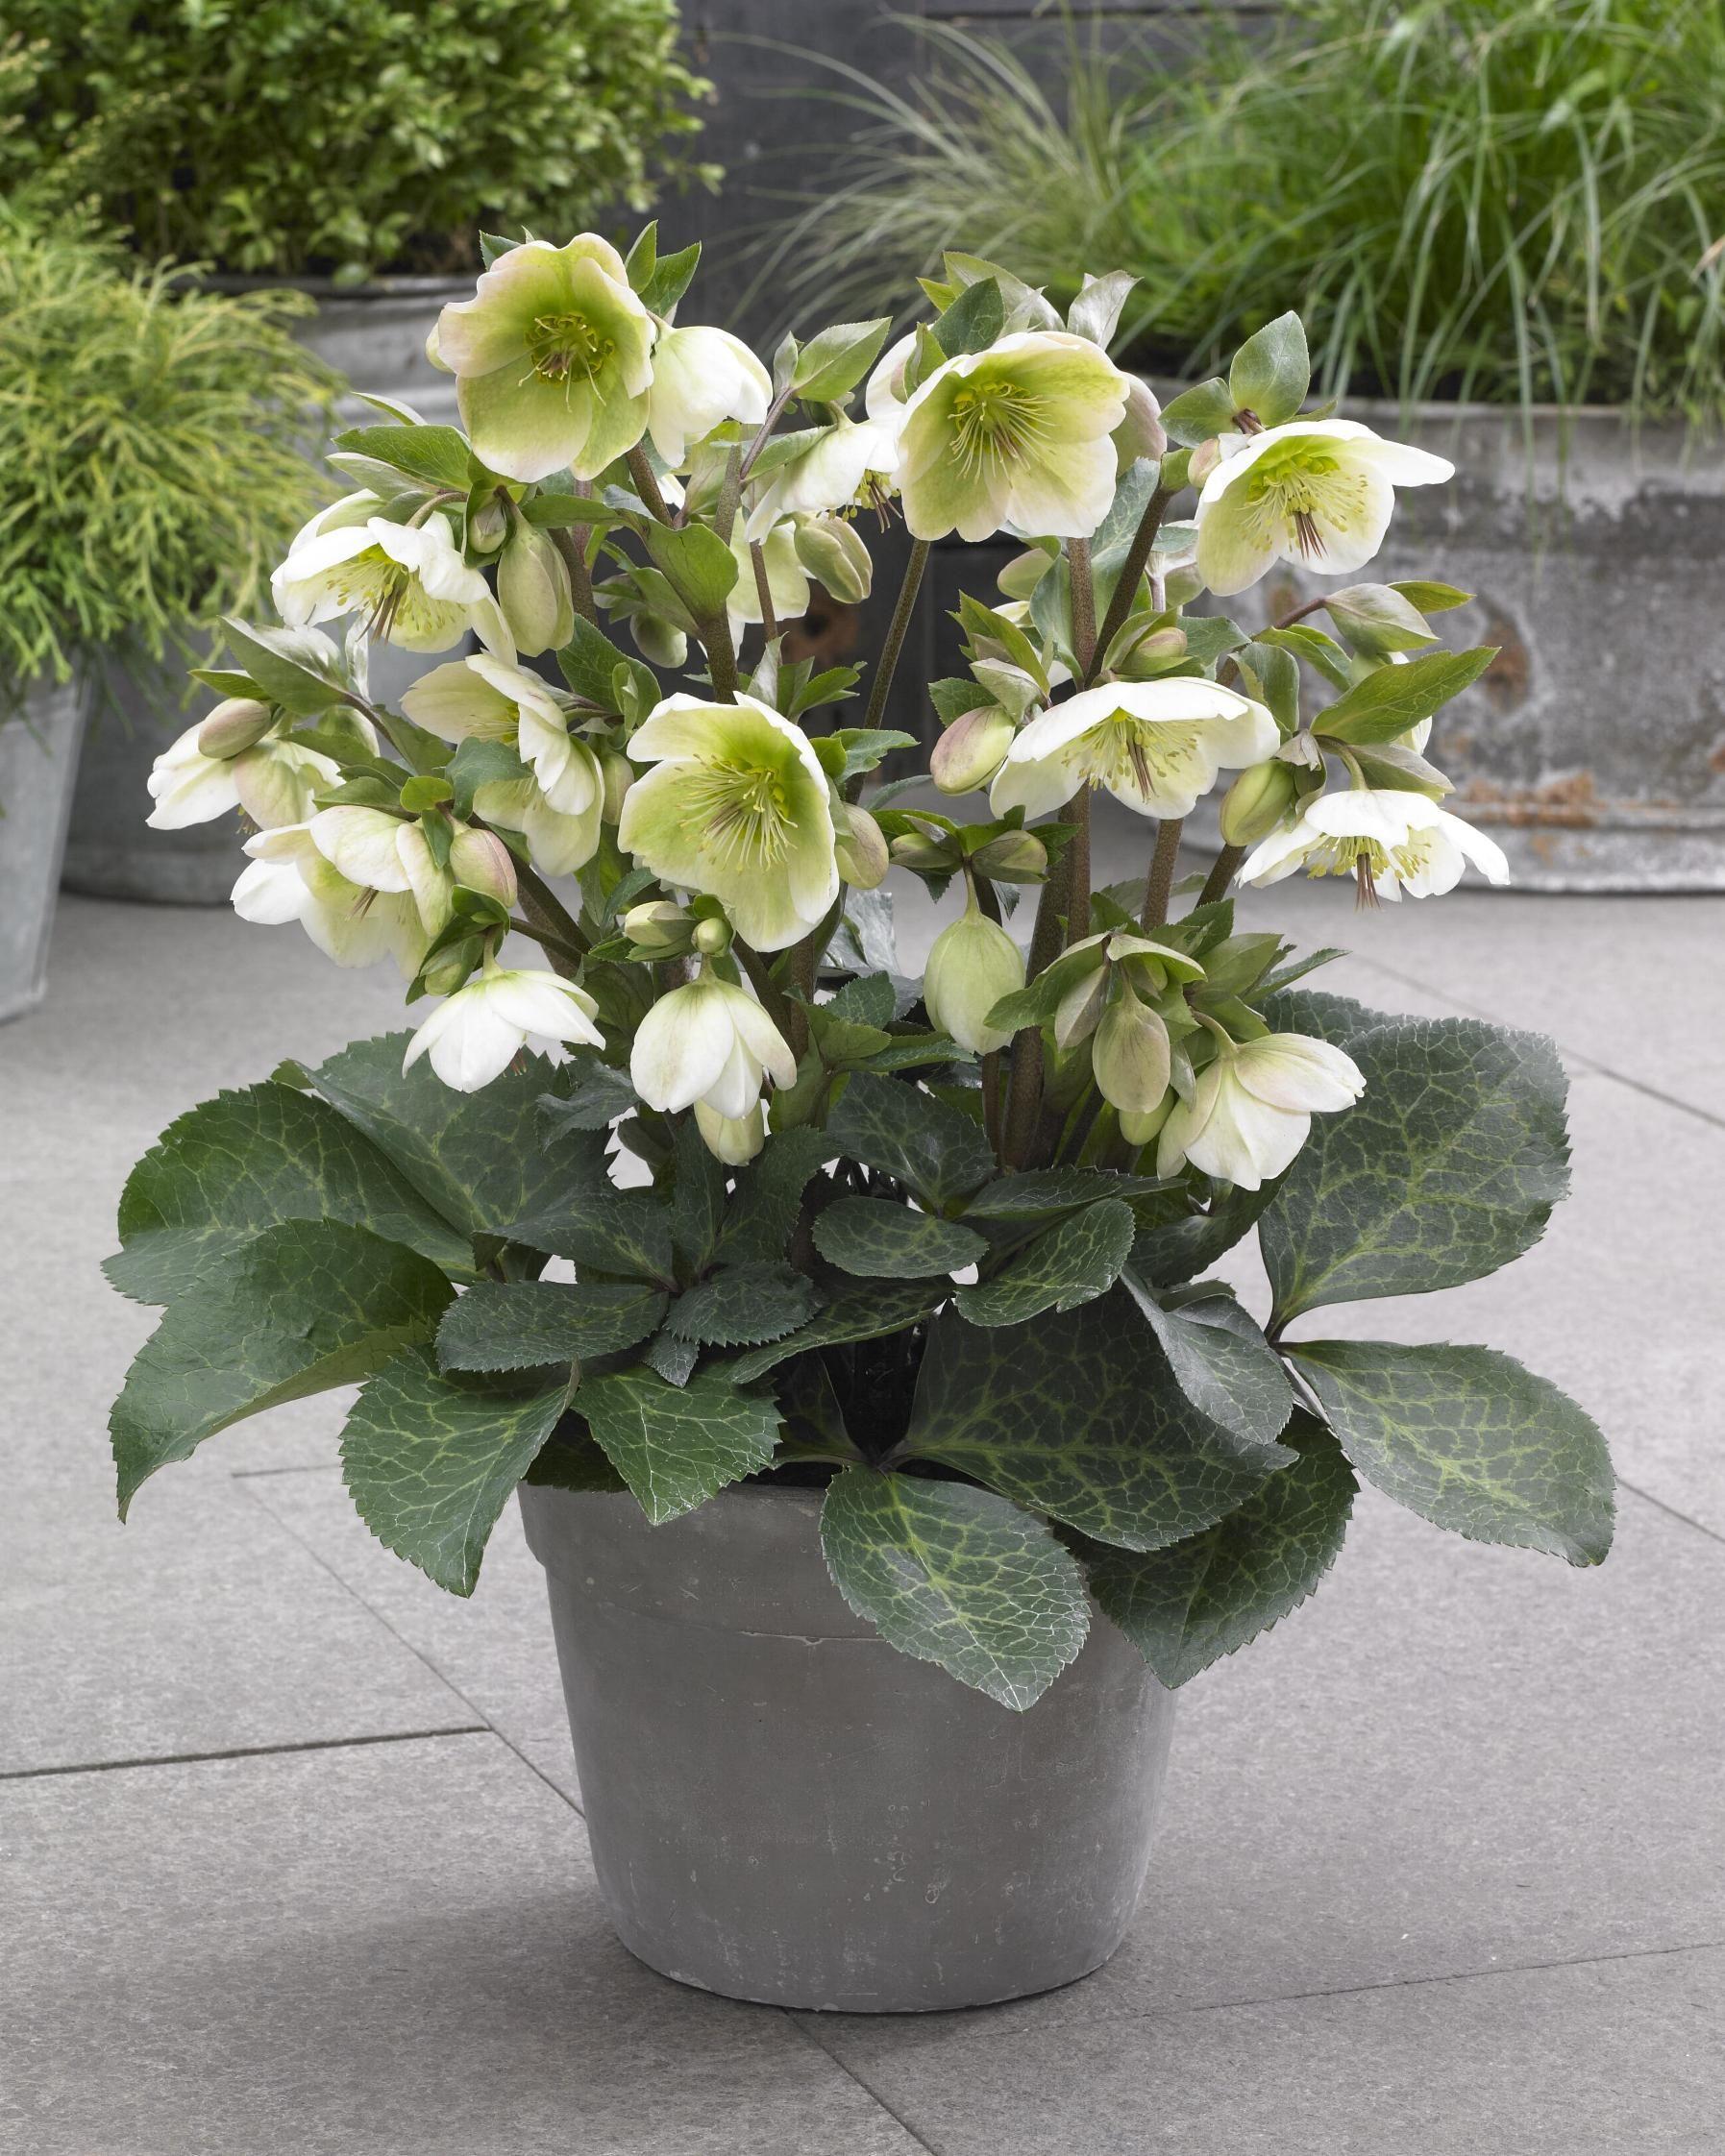 helleborus molly u0027s white bloeiperiode februari april hoogte 25 40